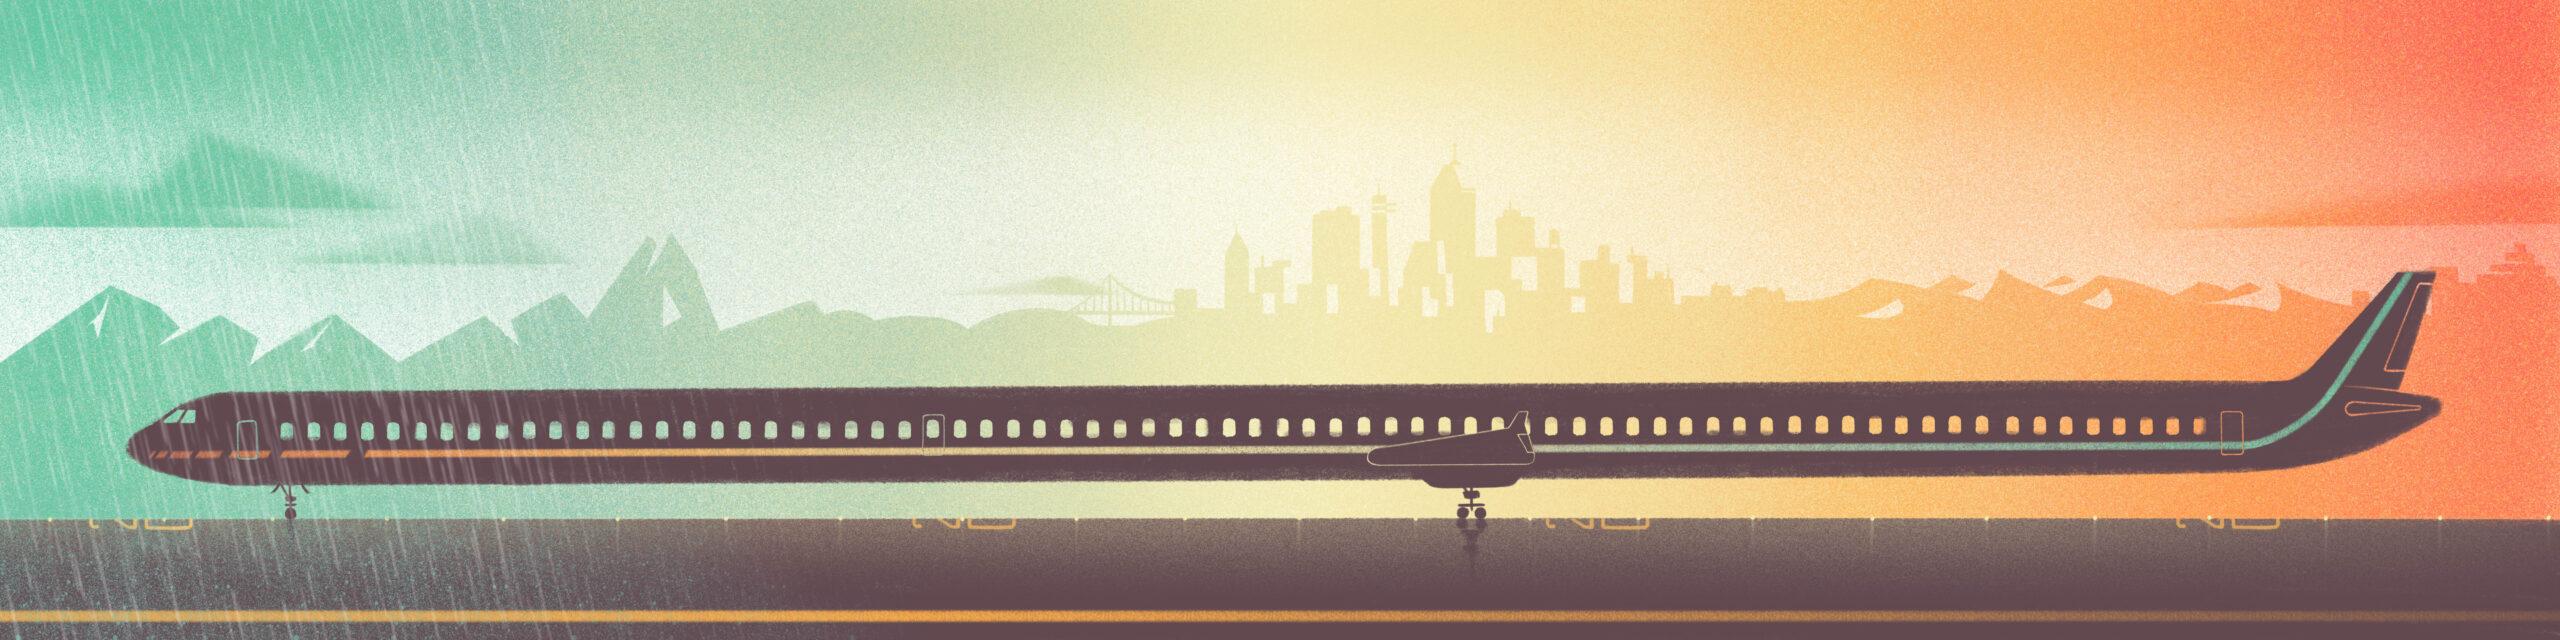 Longest Airplane